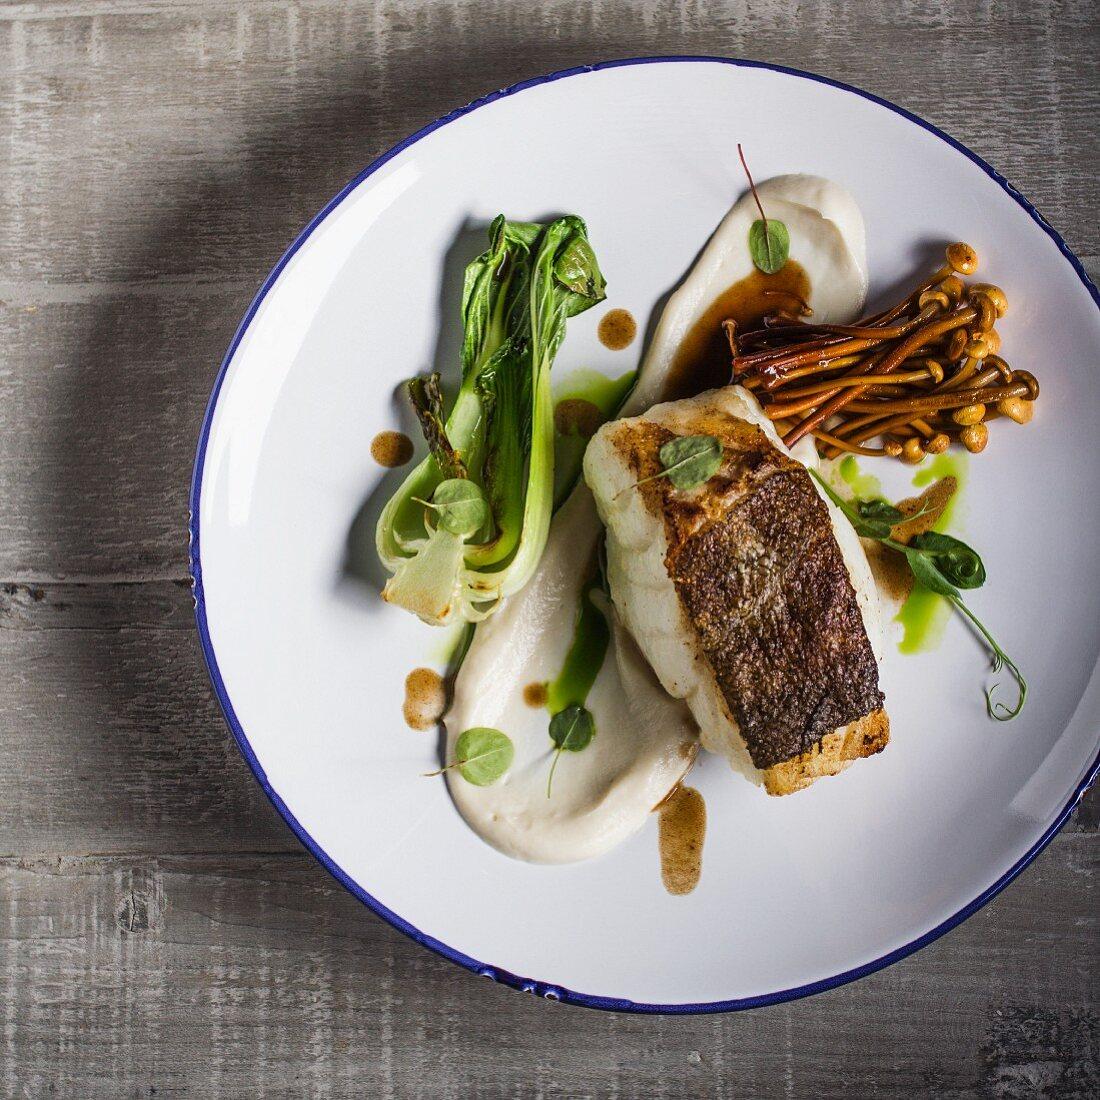 Cod with cauliflower puree, pak choi end enoki mushrooms